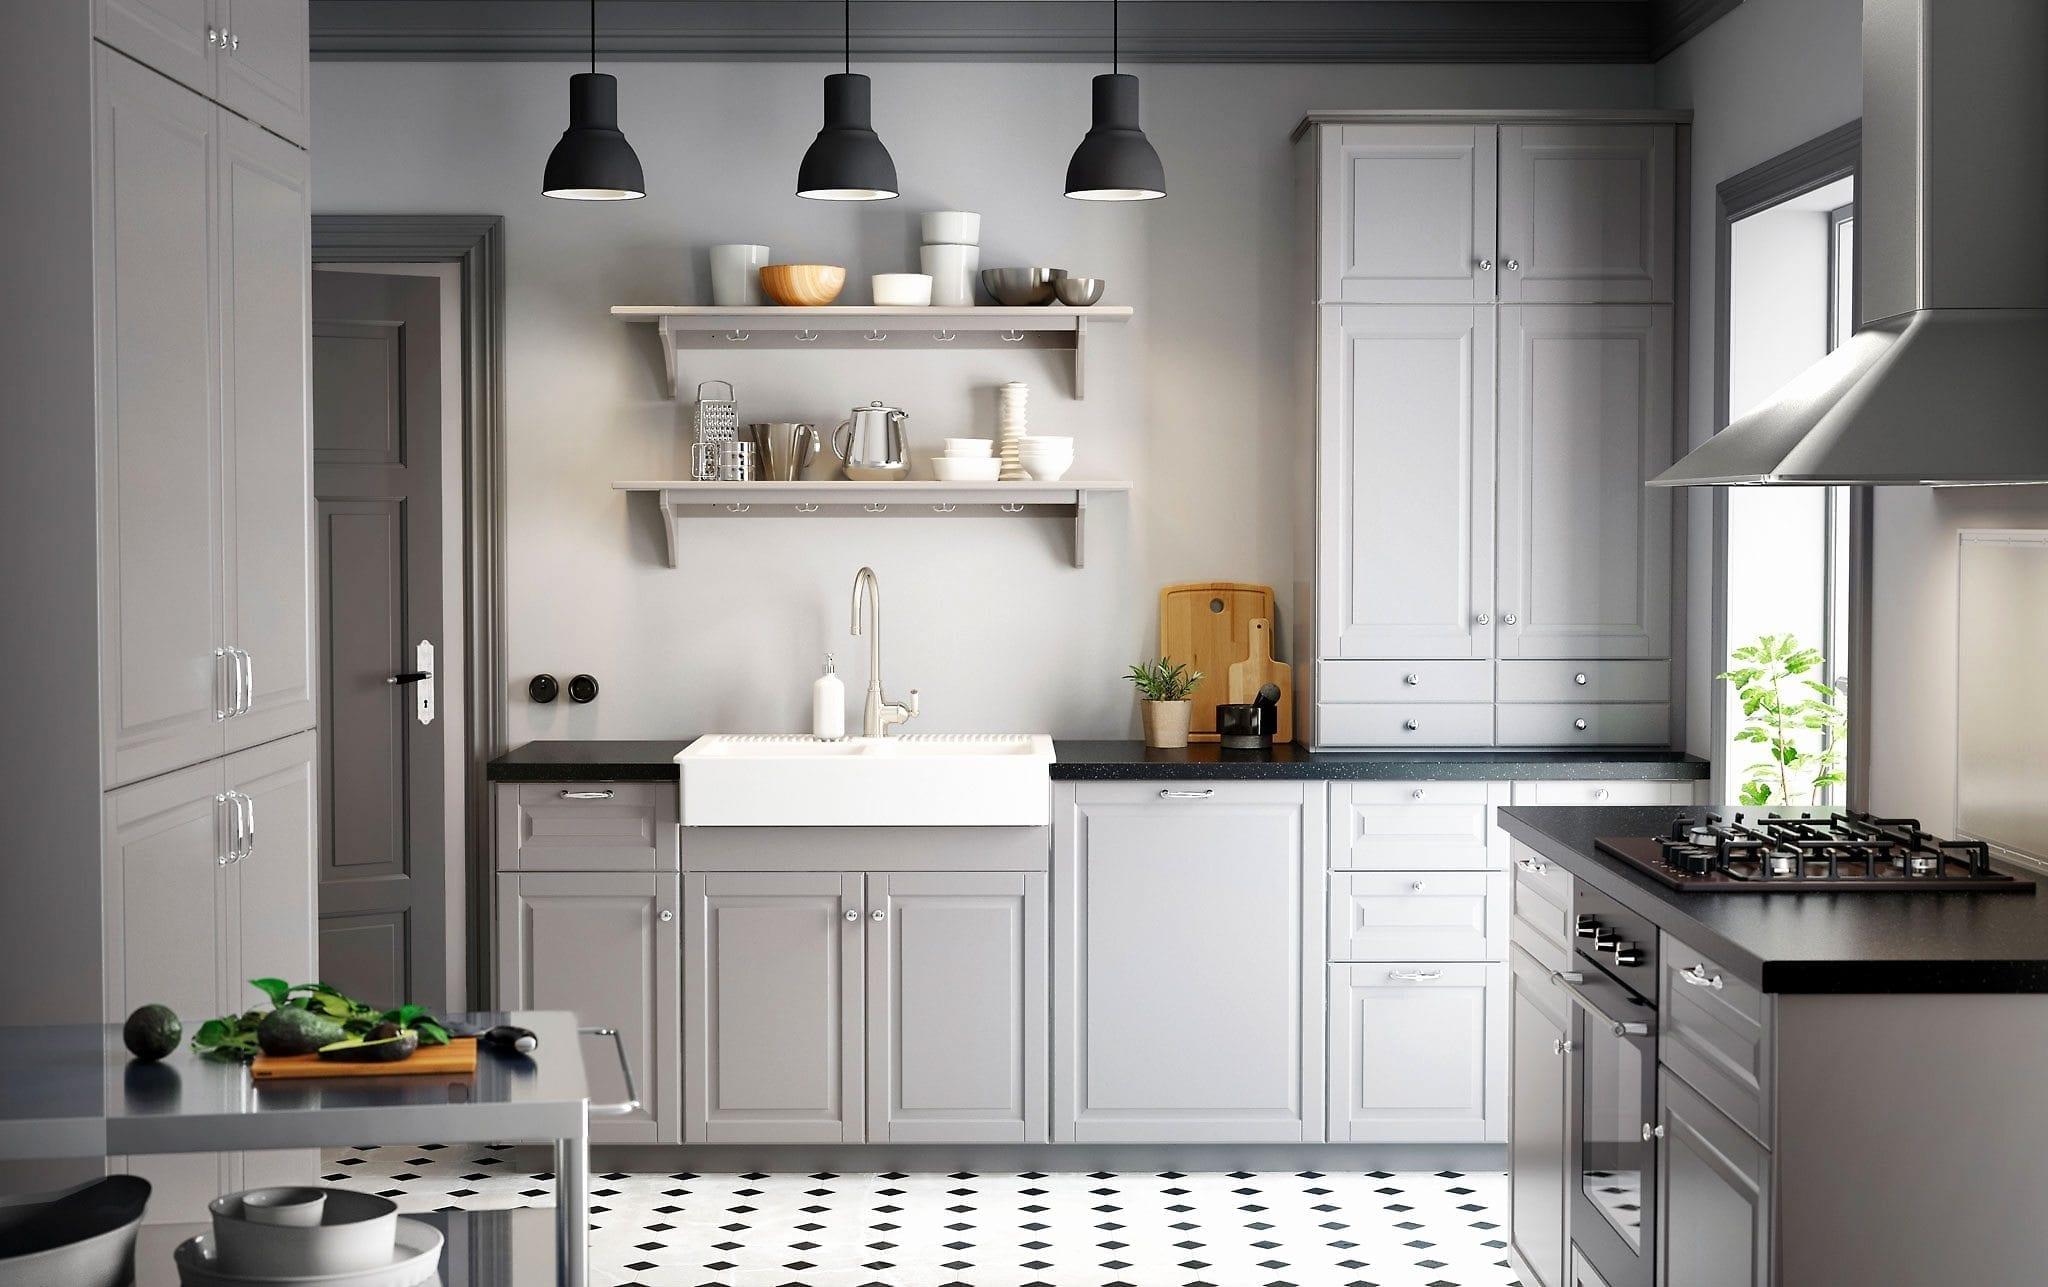 Home renovation reality check | Brouwer Plumbing & Heating